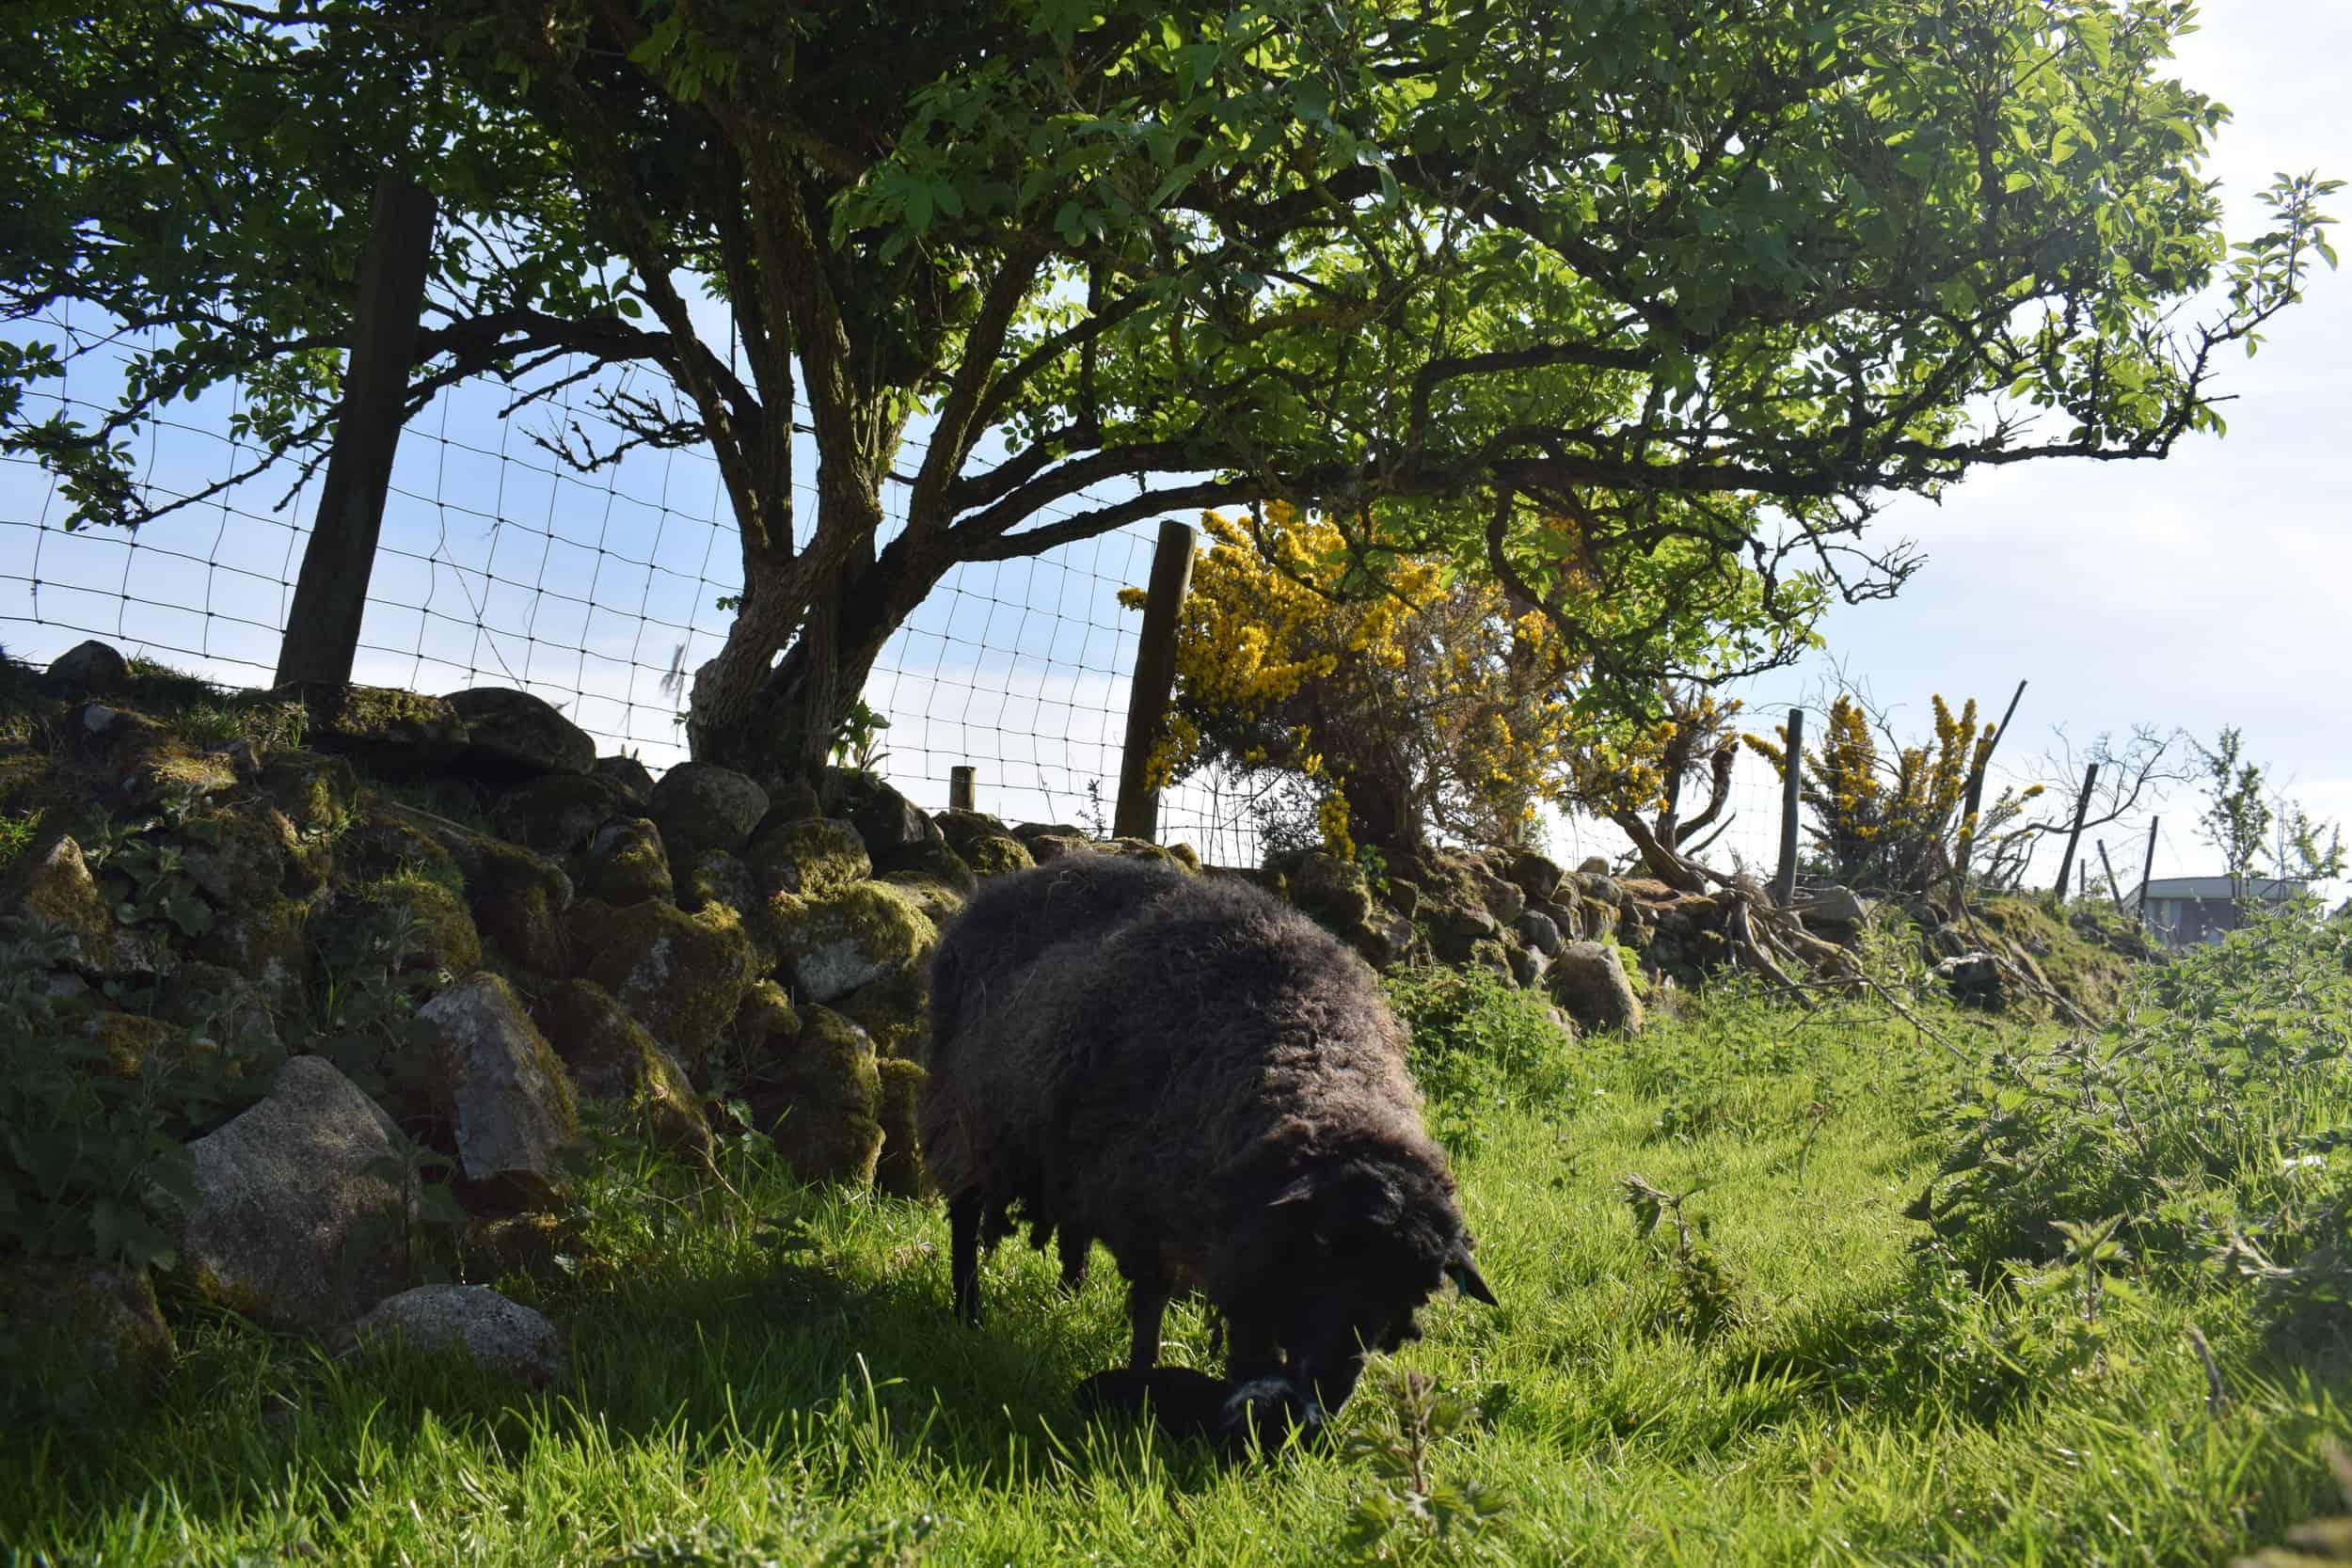 Currant black shetland sheep grandma kind fibre wool crafts under the elder